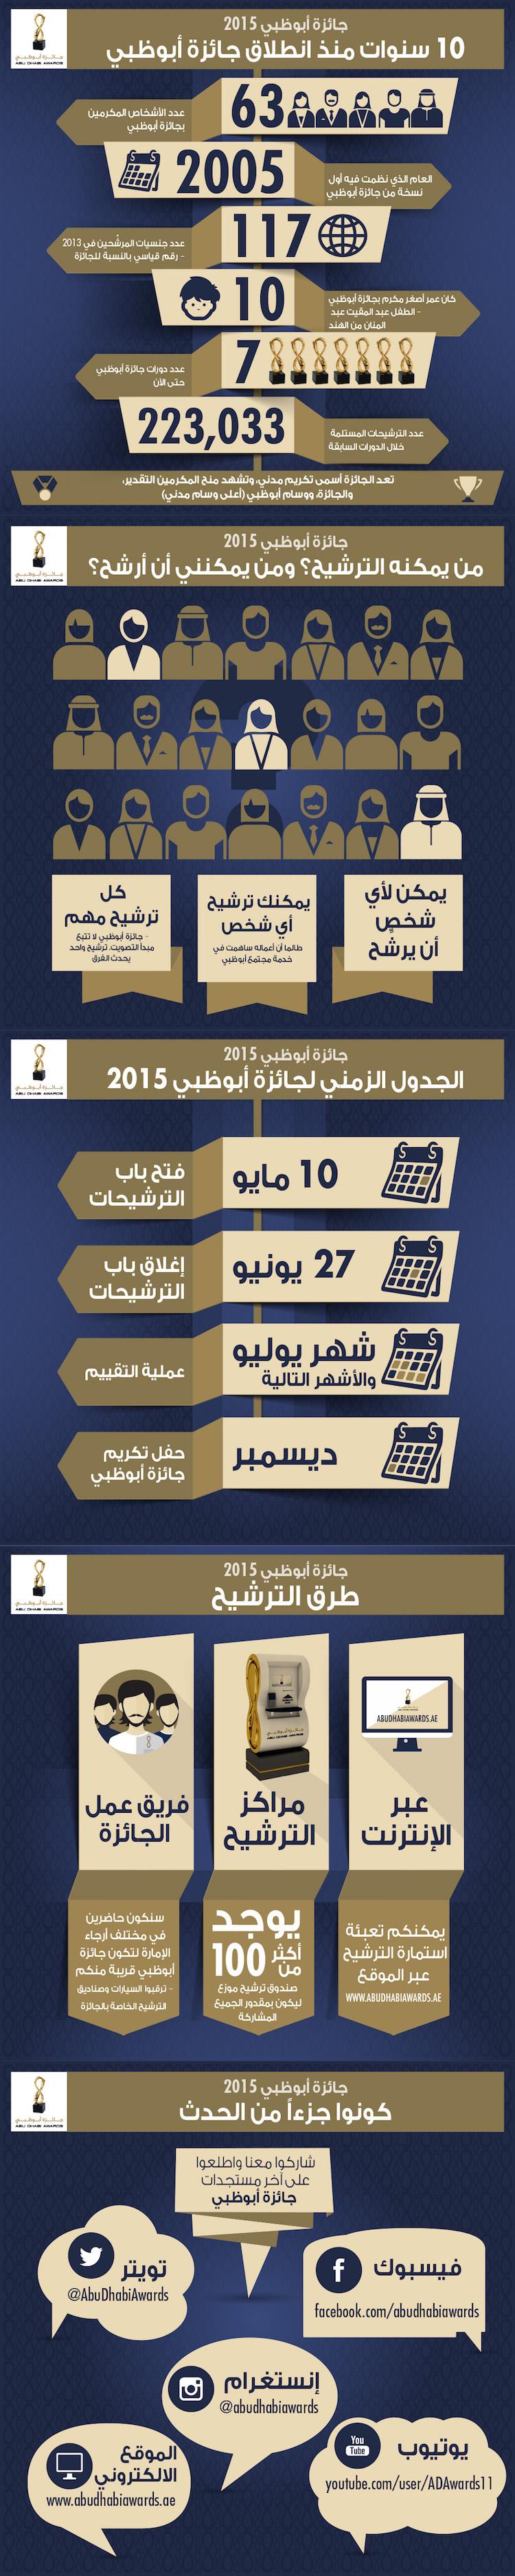 جائزة أبو ظبي 2015